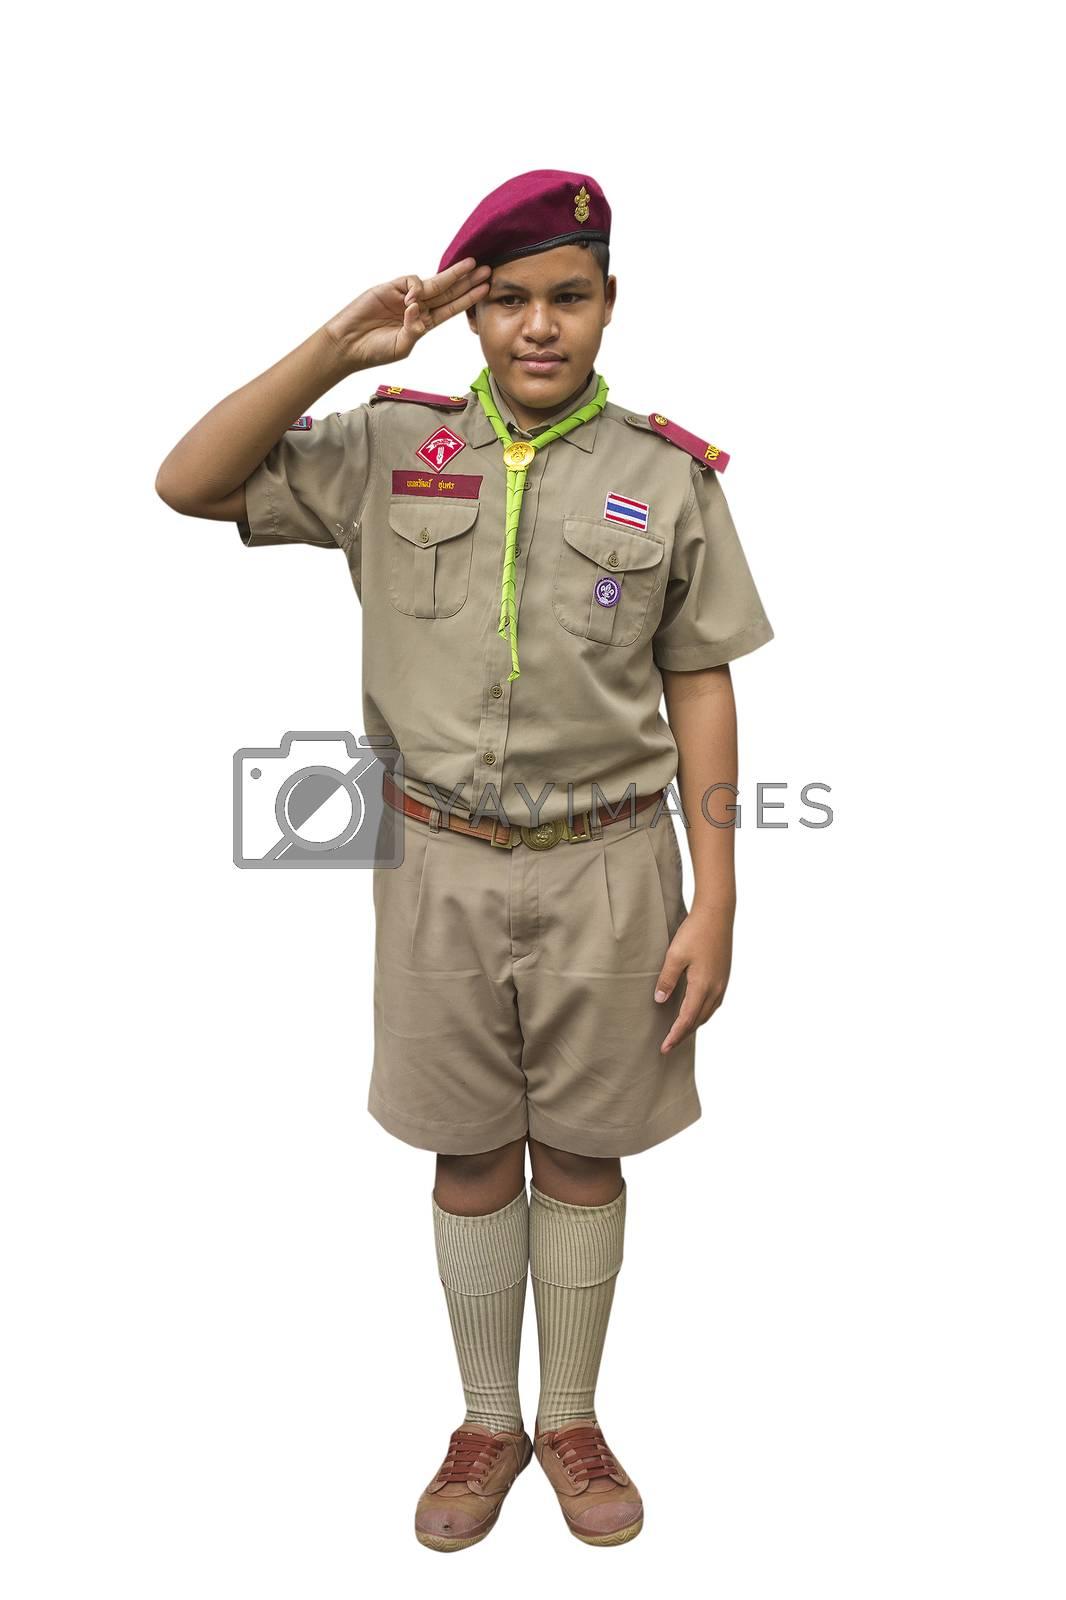 Thai boyscout isolated on white background